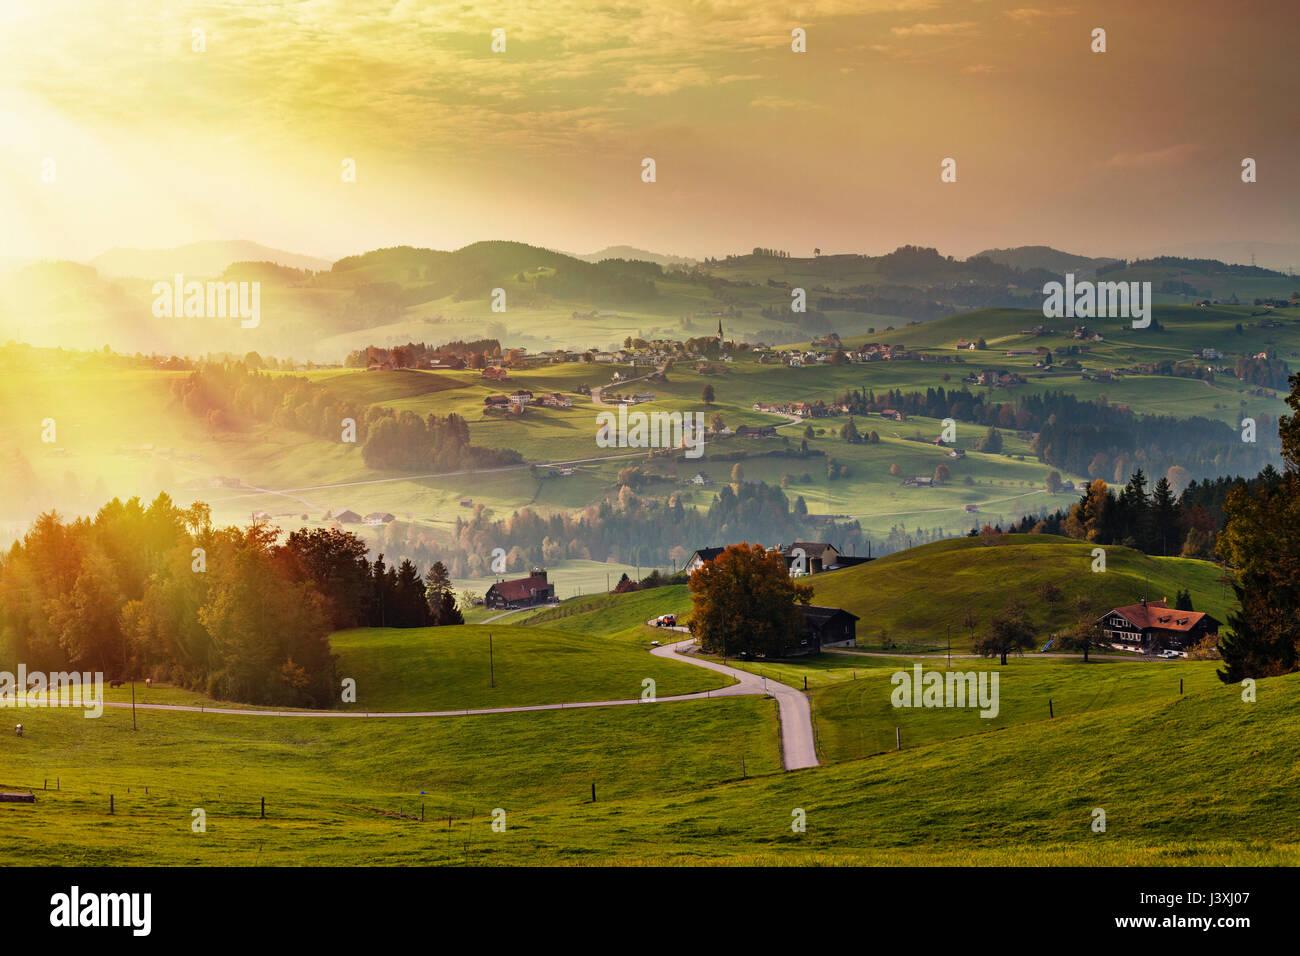 Scenic view, Appenzell, Appenzellerland, Switzerland - Stock Image